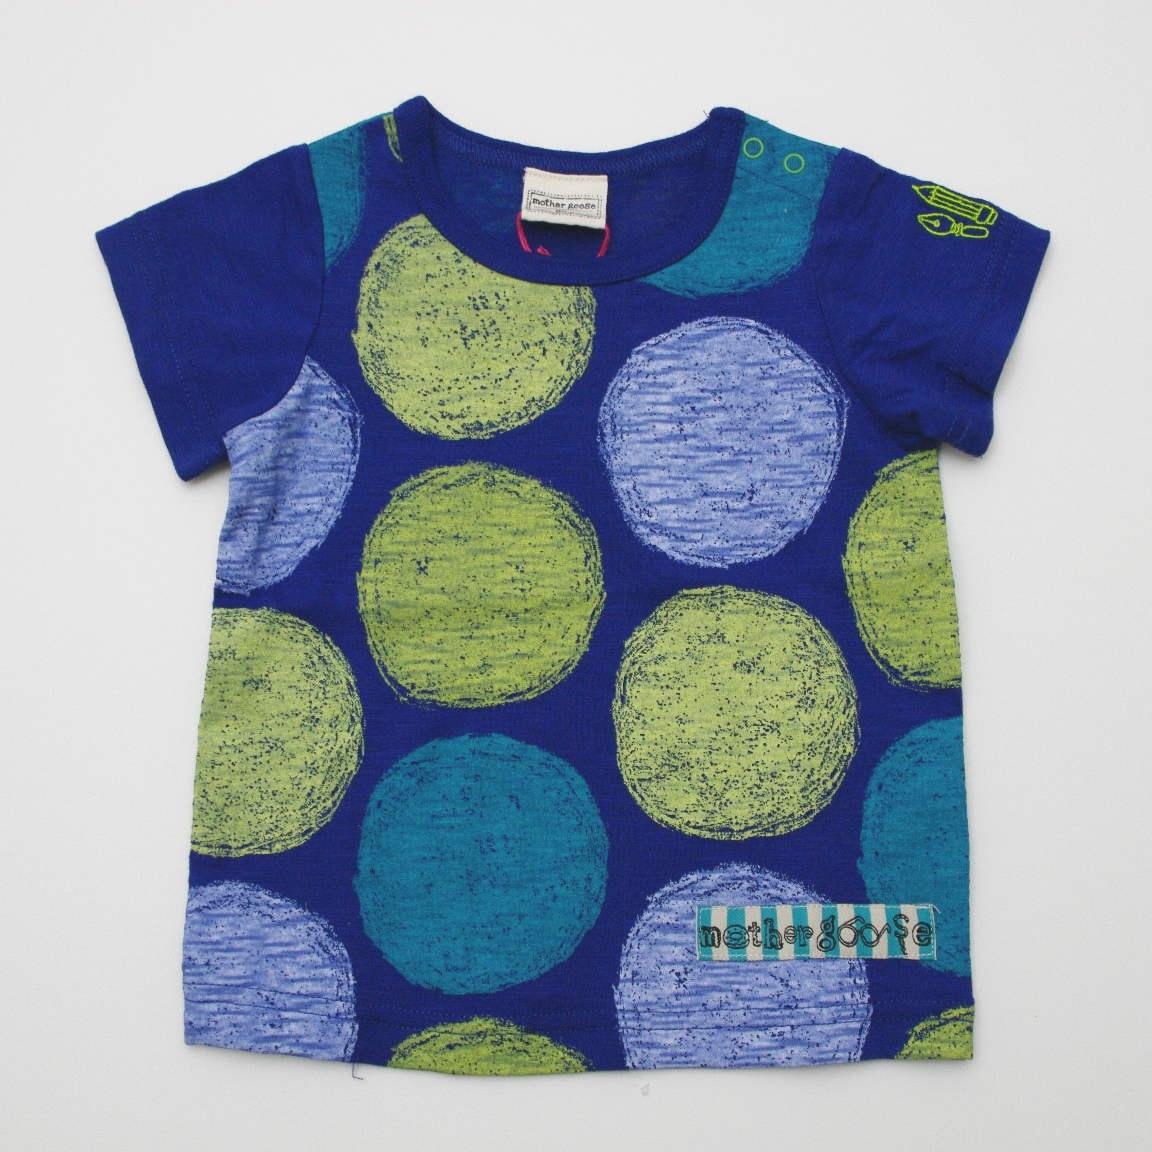 mother goose(マザーグース)半袖Tシャツ ブルー 80cm/90cm/100cm (11132-142)